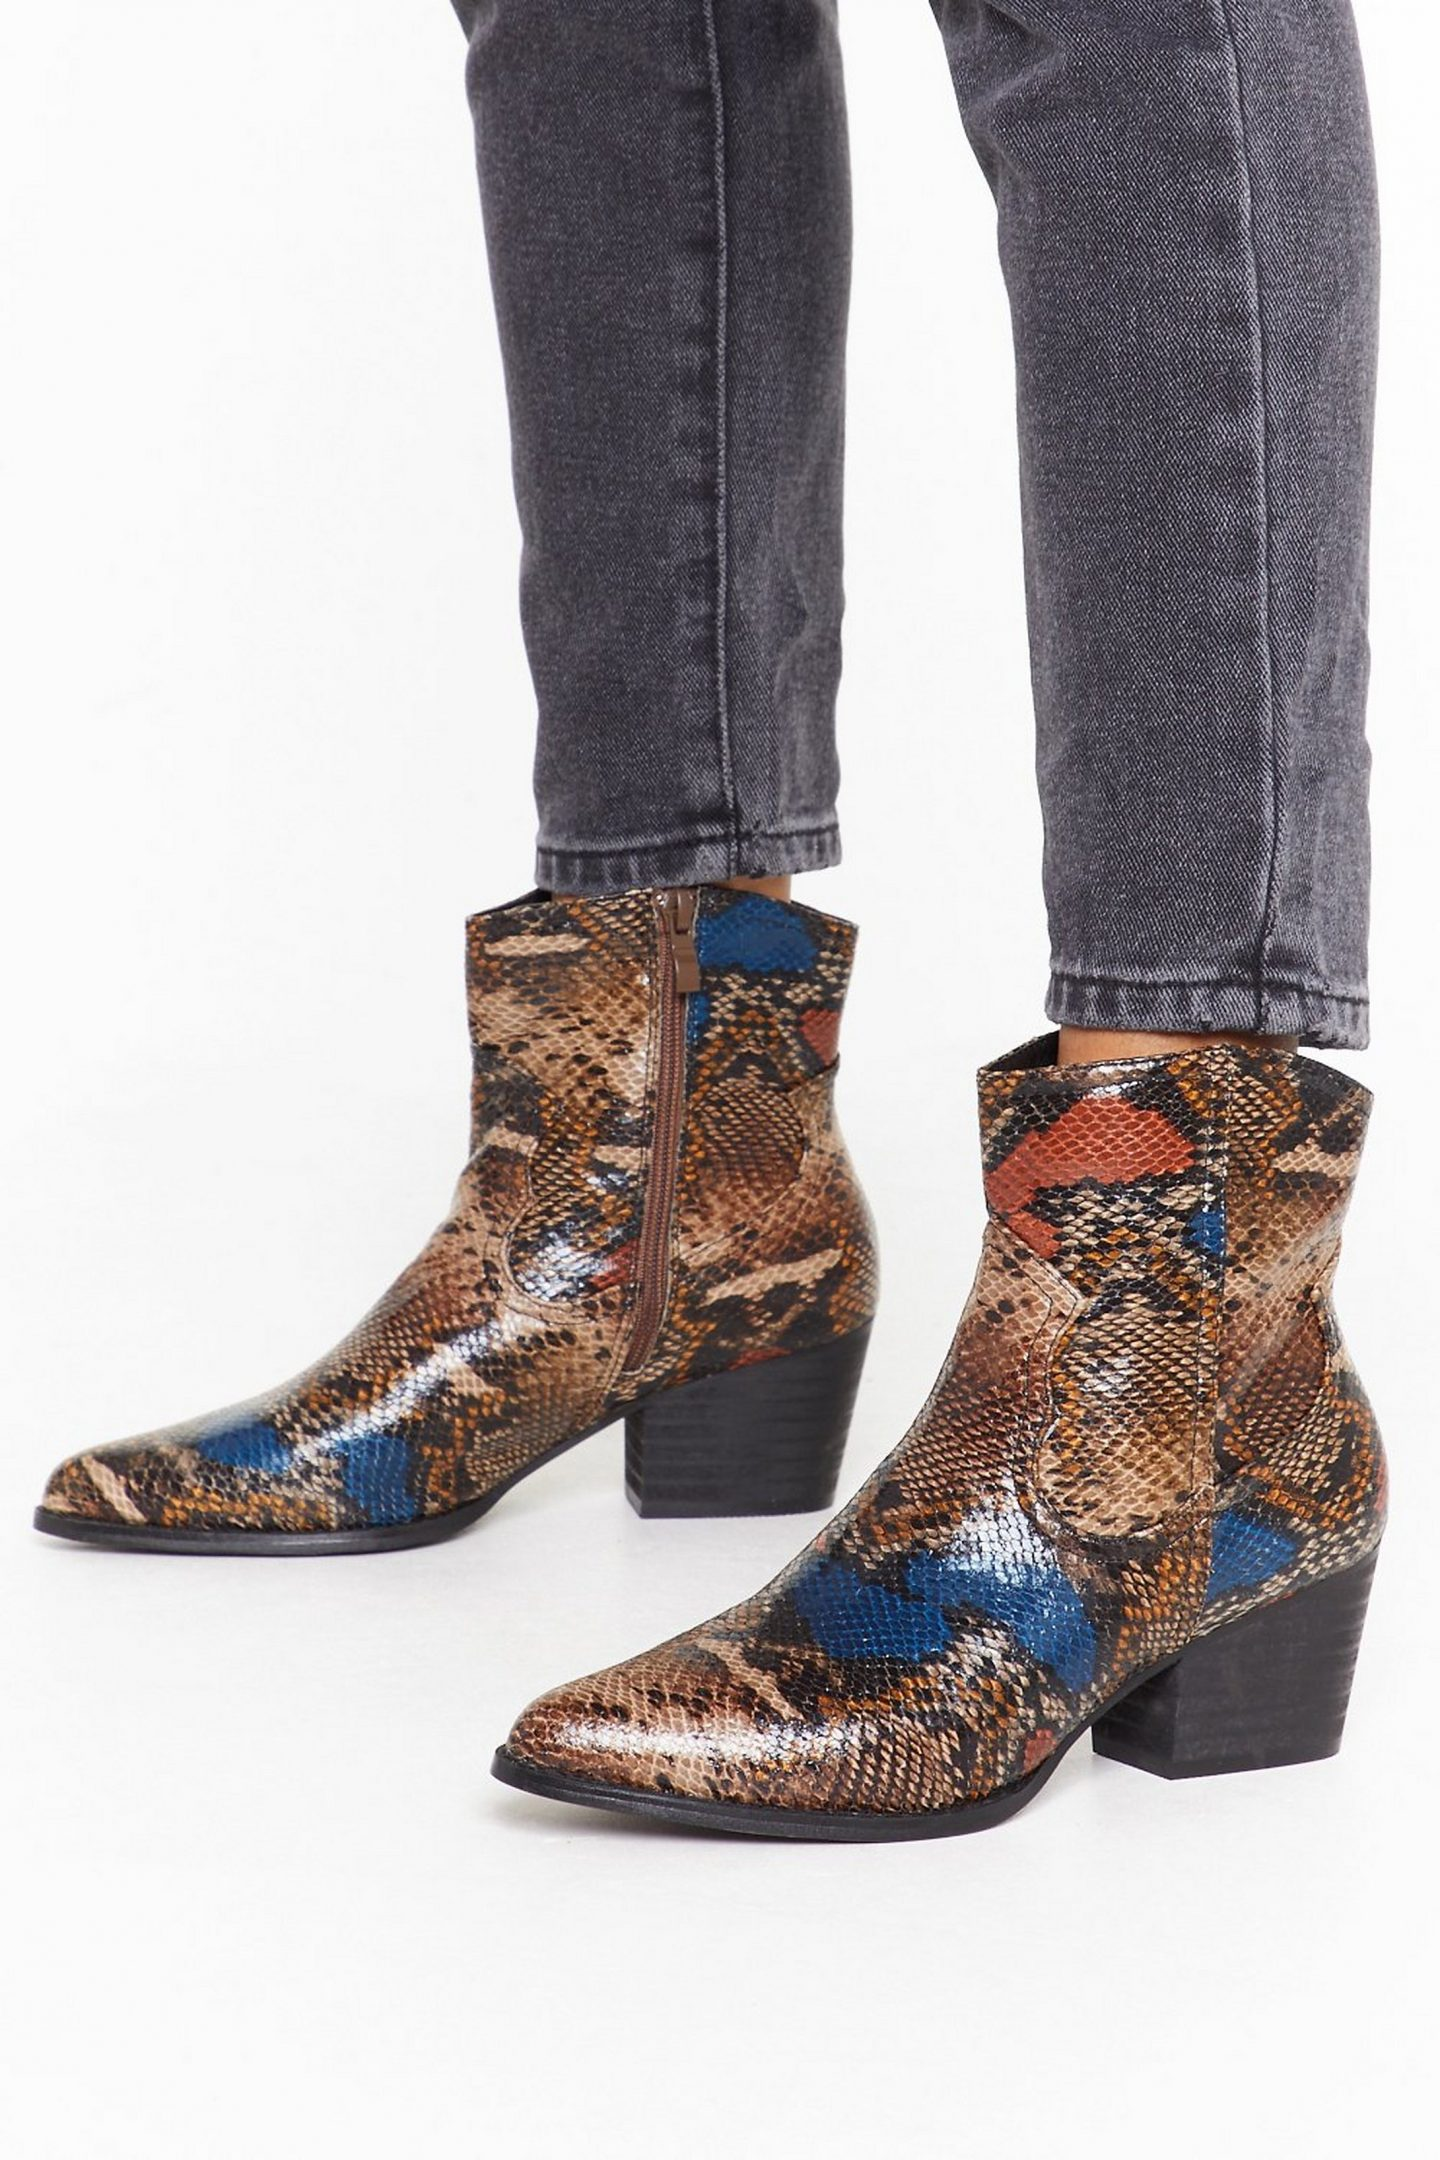 nasty gal boots and booties שירי ויצנר 7